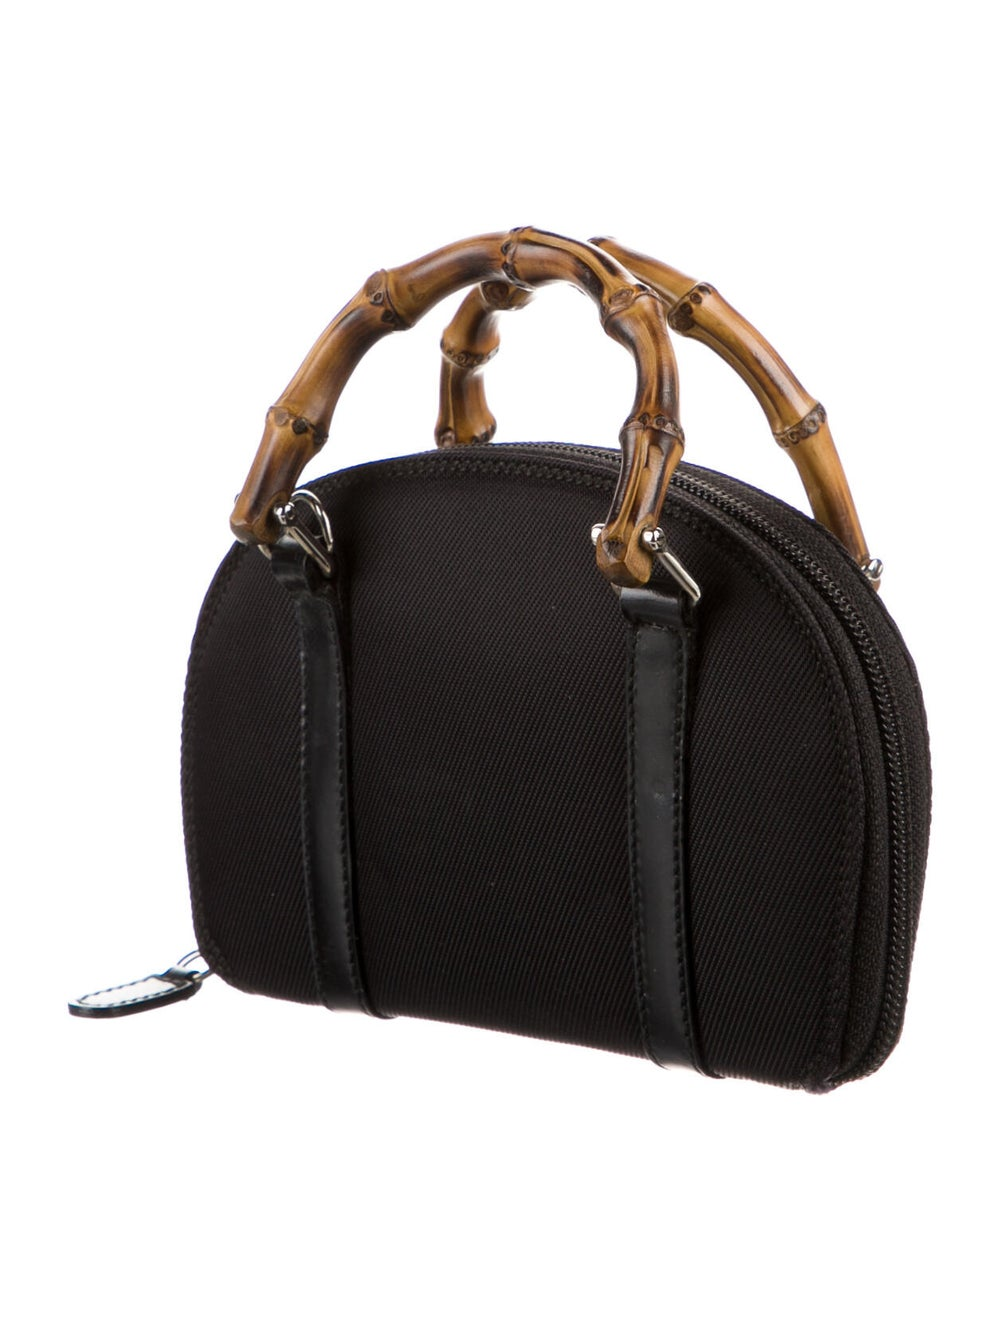 Gucci Vintage Mini Bamboo Handle Bag Black - image 3